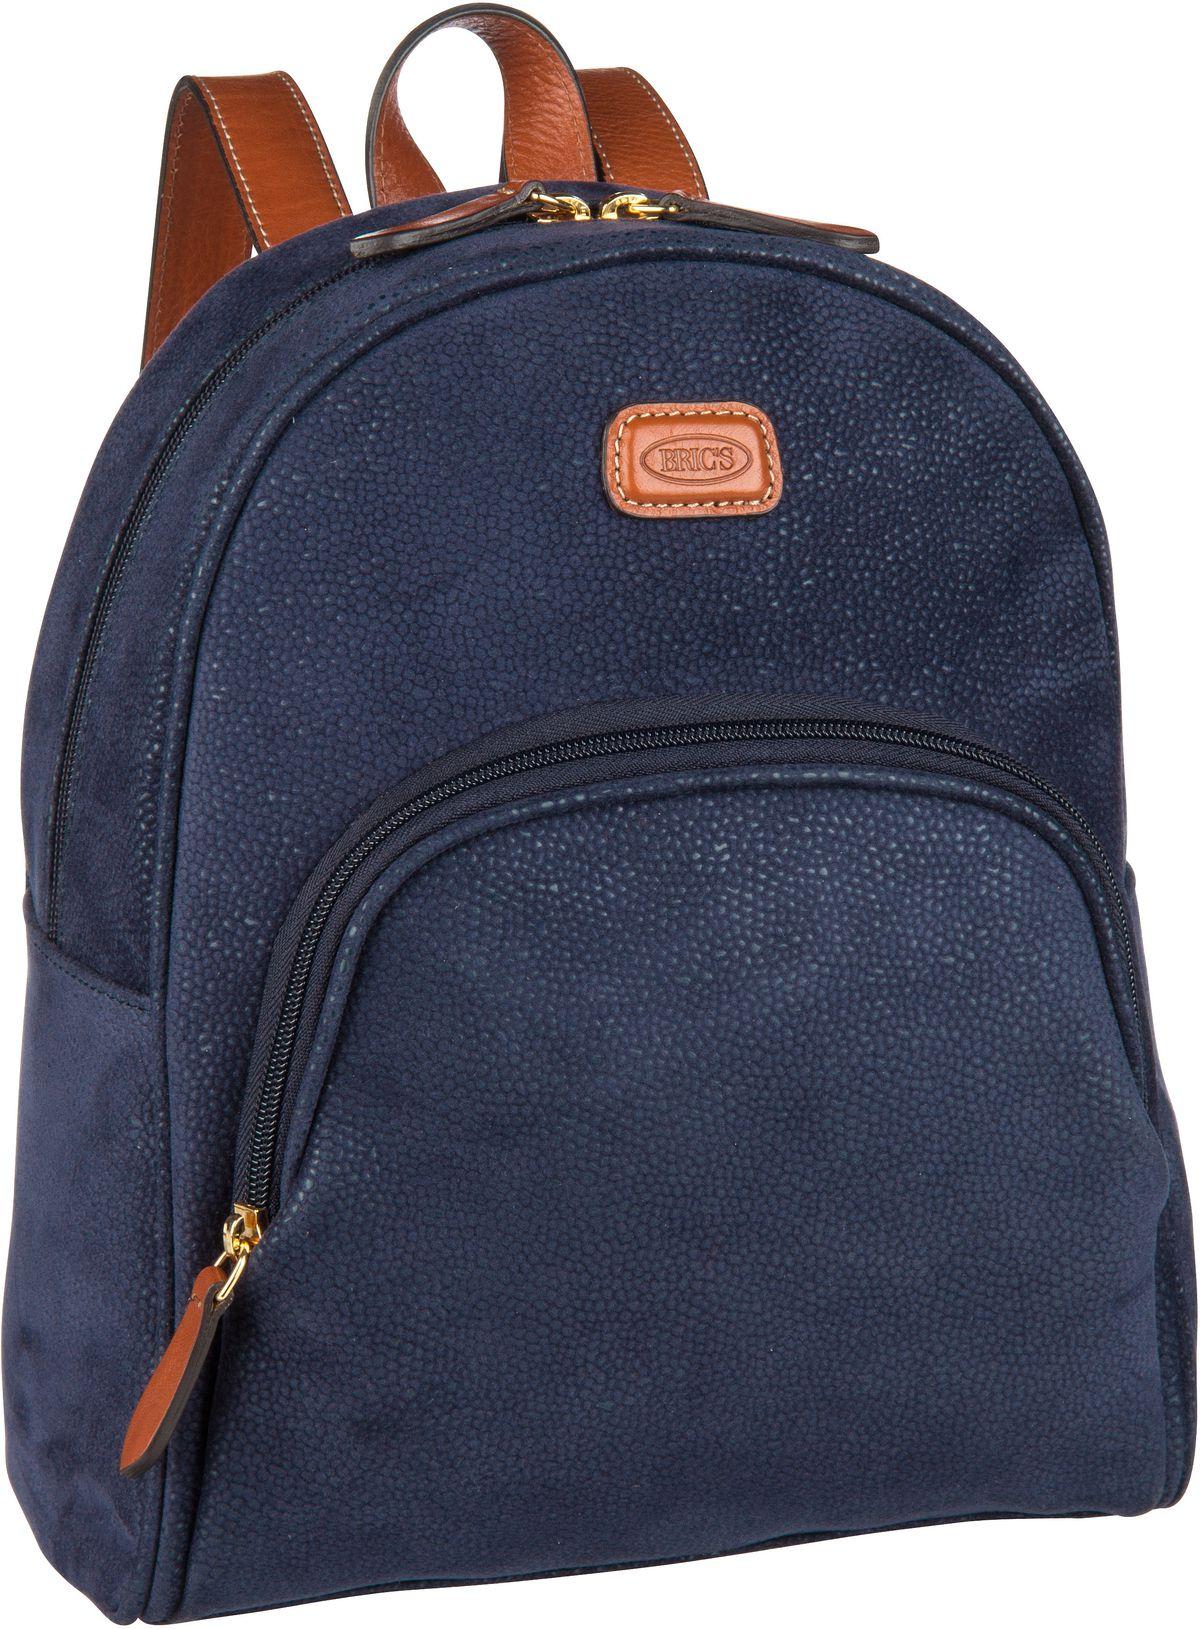 's Rucksack / Daypack Life Rucksack 51656 Blu